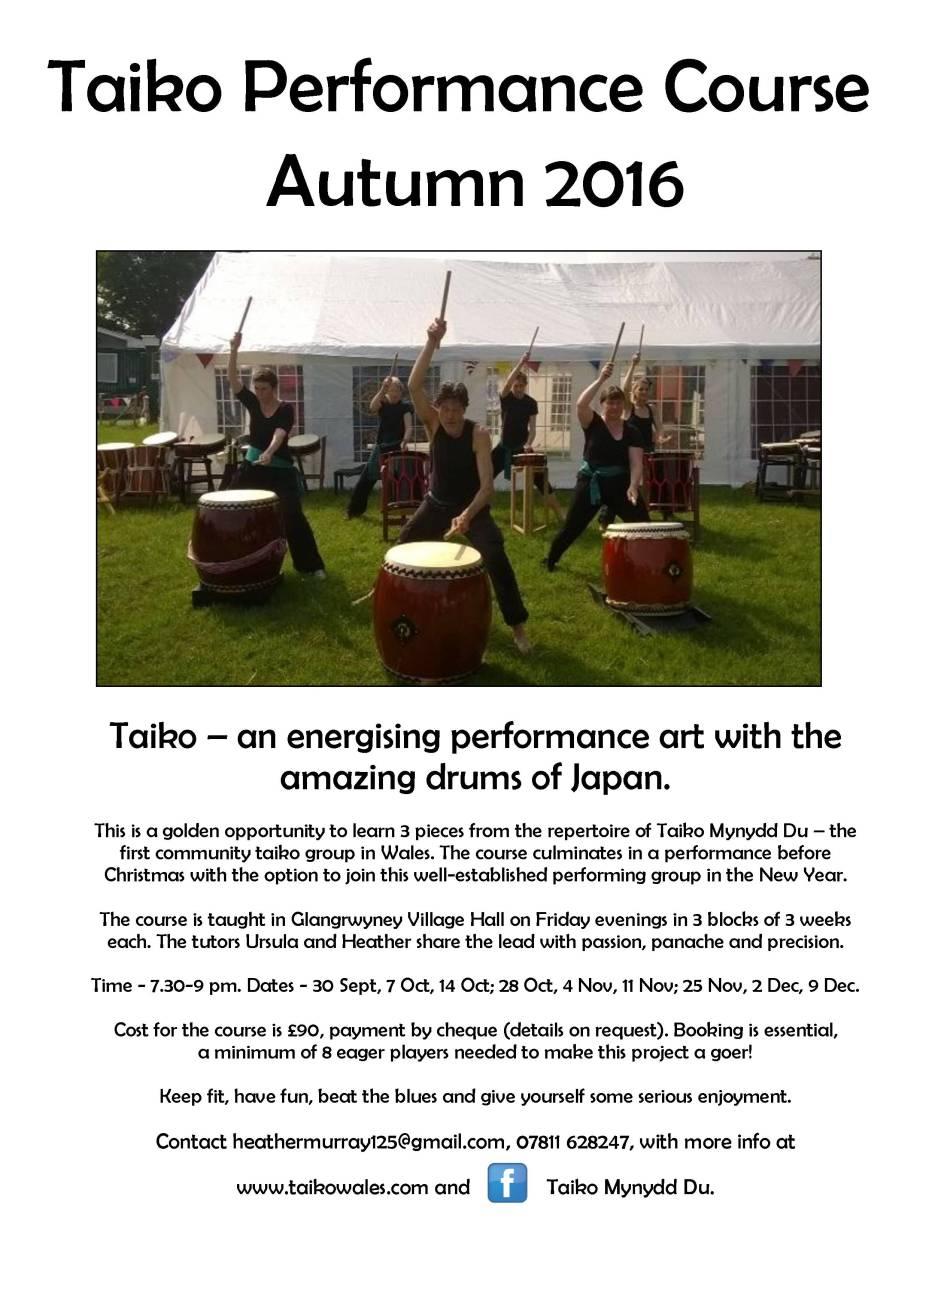 taiko poster Sept 2016